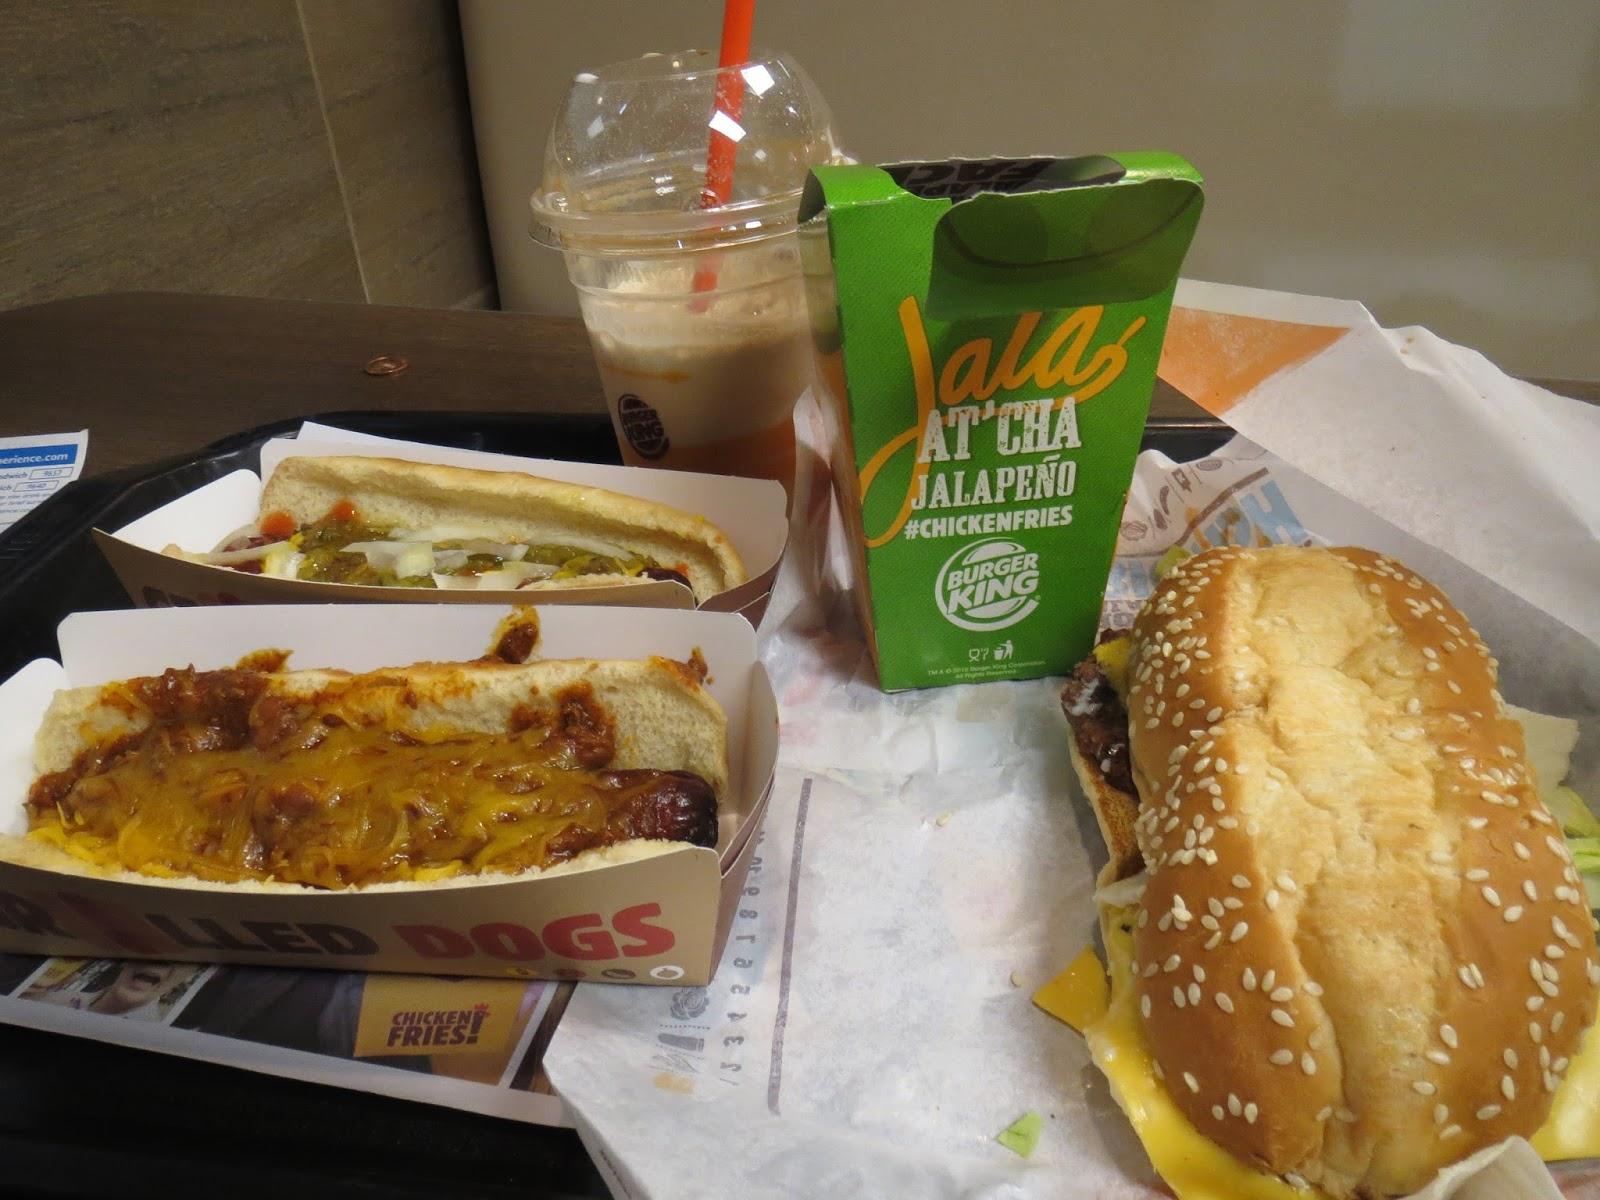 Burger King Bonanza Winter 2016 Edition Dr Pepper Milkshakes Jalapeno Chicken Fries